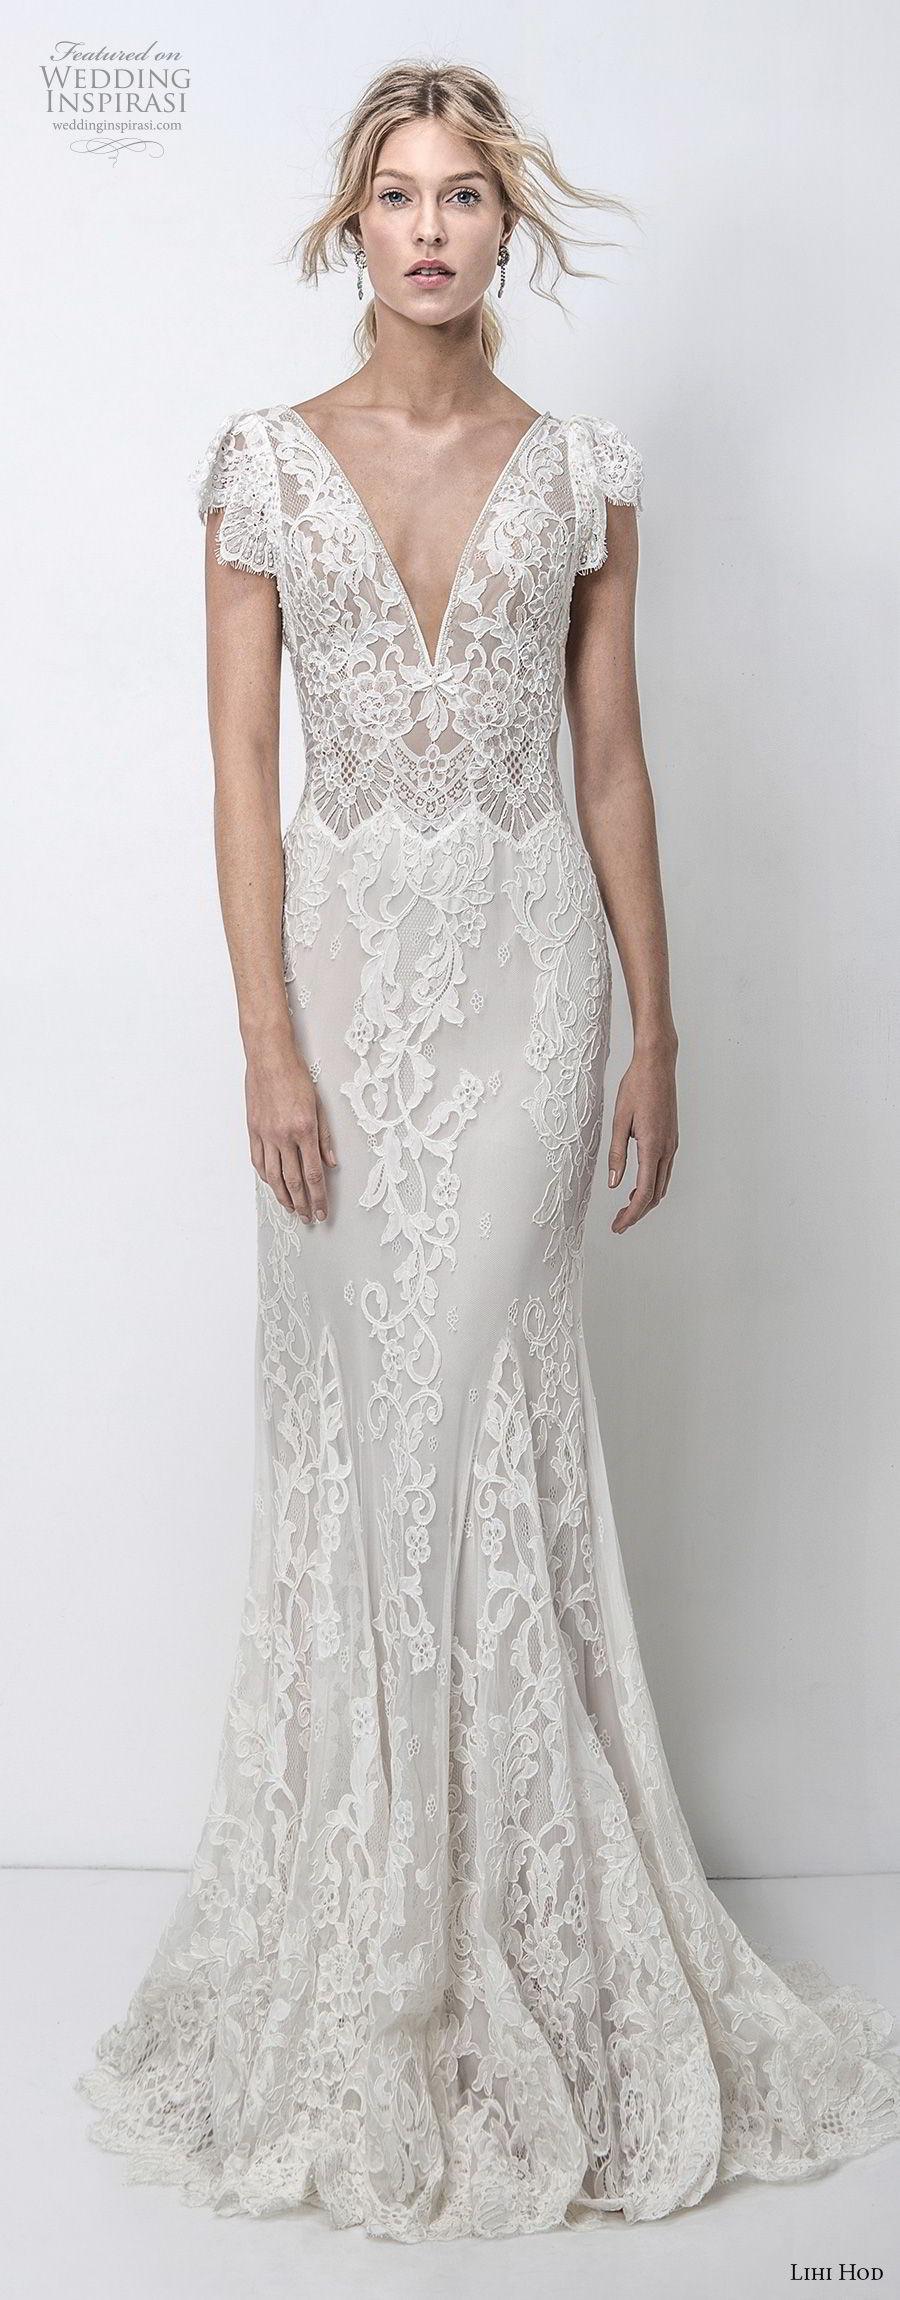 lihi hod 2018 bridal cap sleeves v neck full embellishment elegant romantic fit and flare sheath wedding dress open scoop back sweep train (8) fv mv